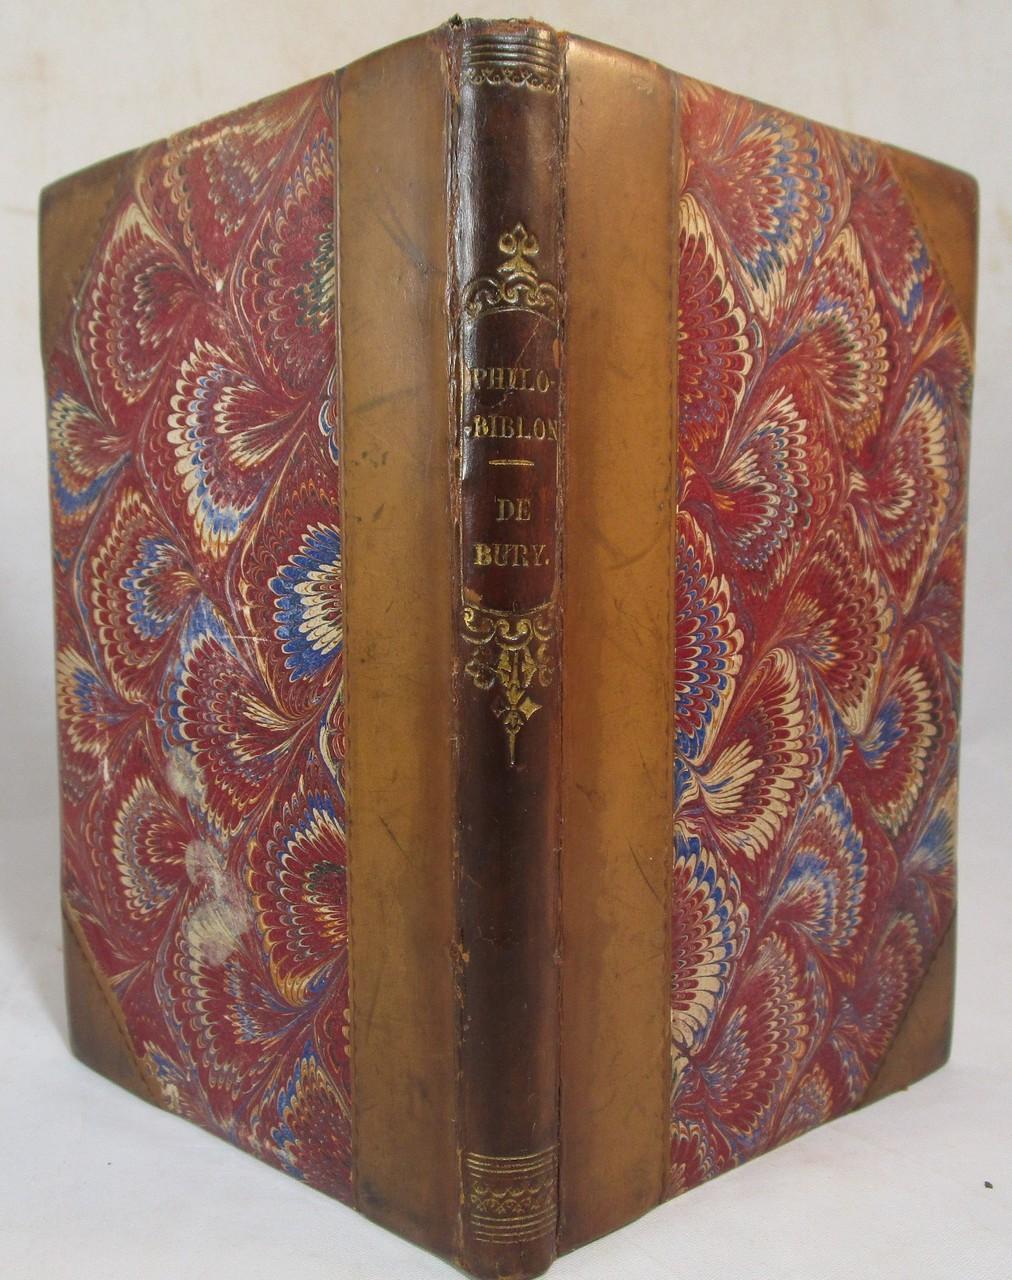 PHILOBIBLON, A TREATISE ON THE LOVE OF BOOKS, by Richard de Bury - 1832